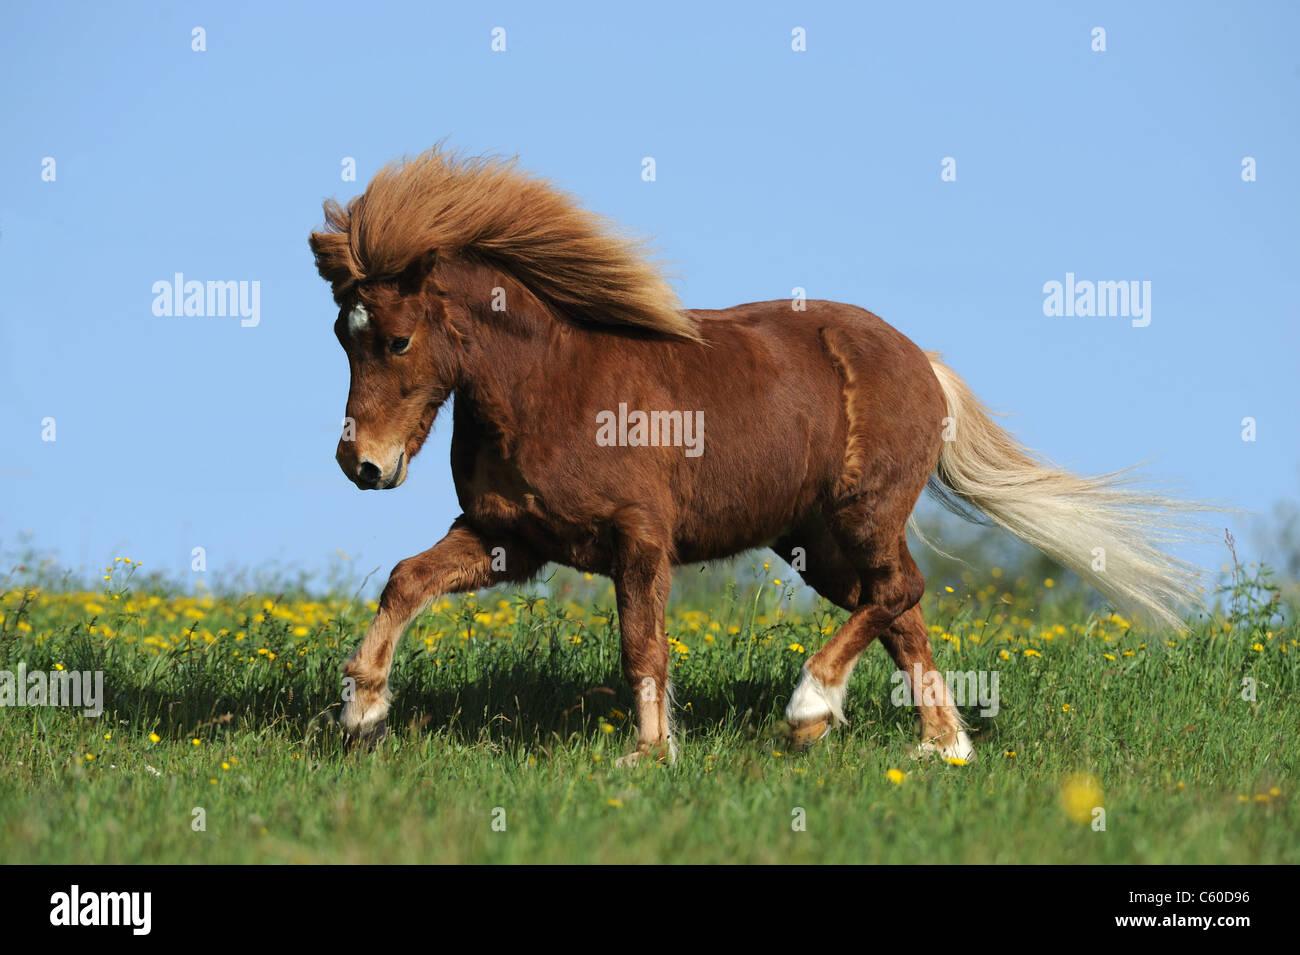 Caballo islandés (Equus ferus caballus) en un trote en una pradera. Imagen De Stock